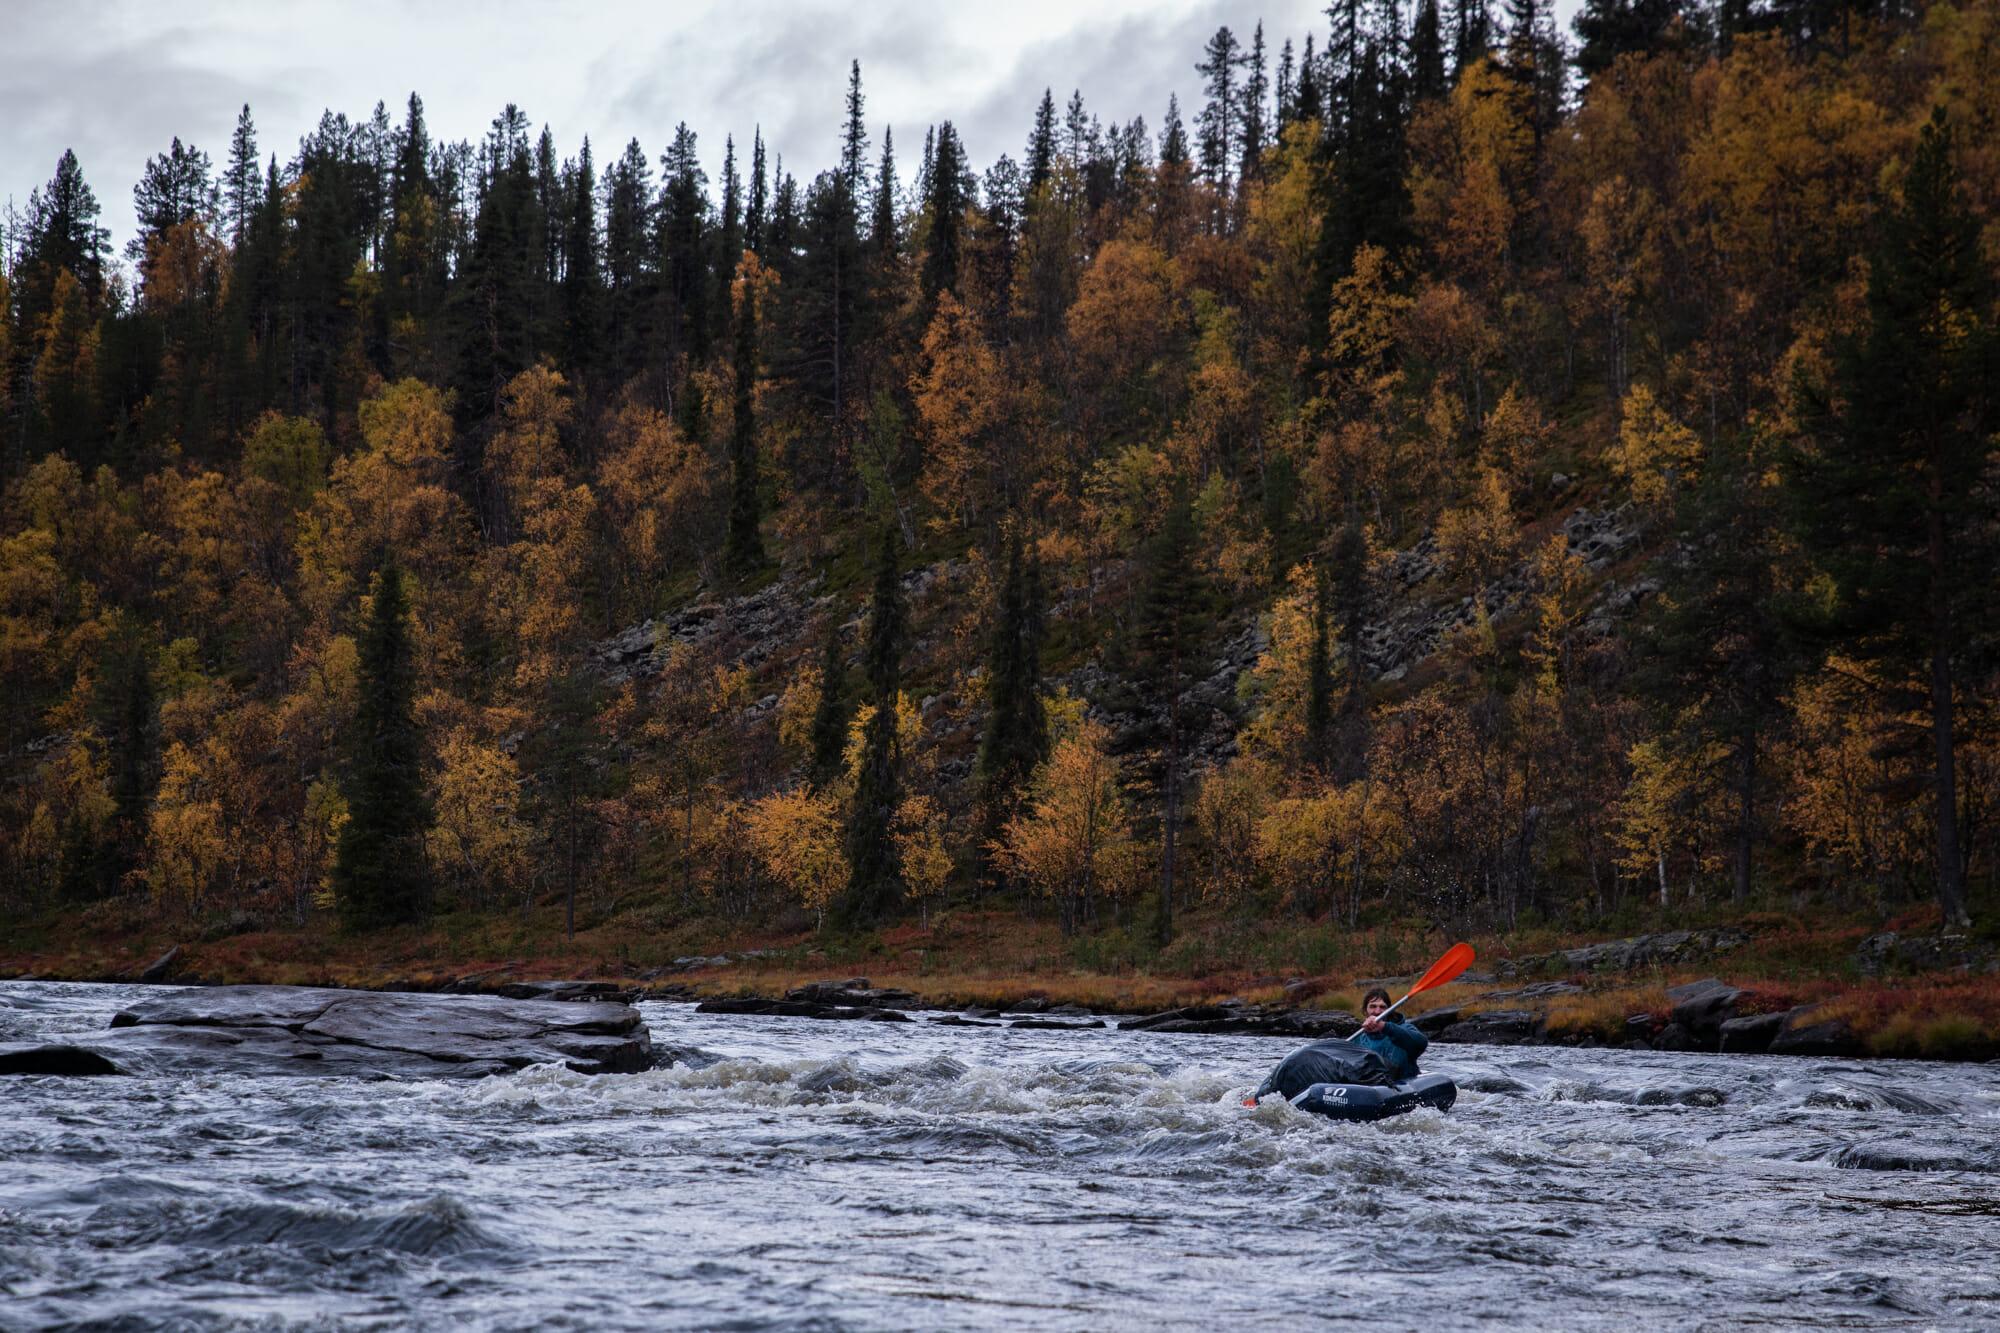 La rivière Ivalojoki en packraft